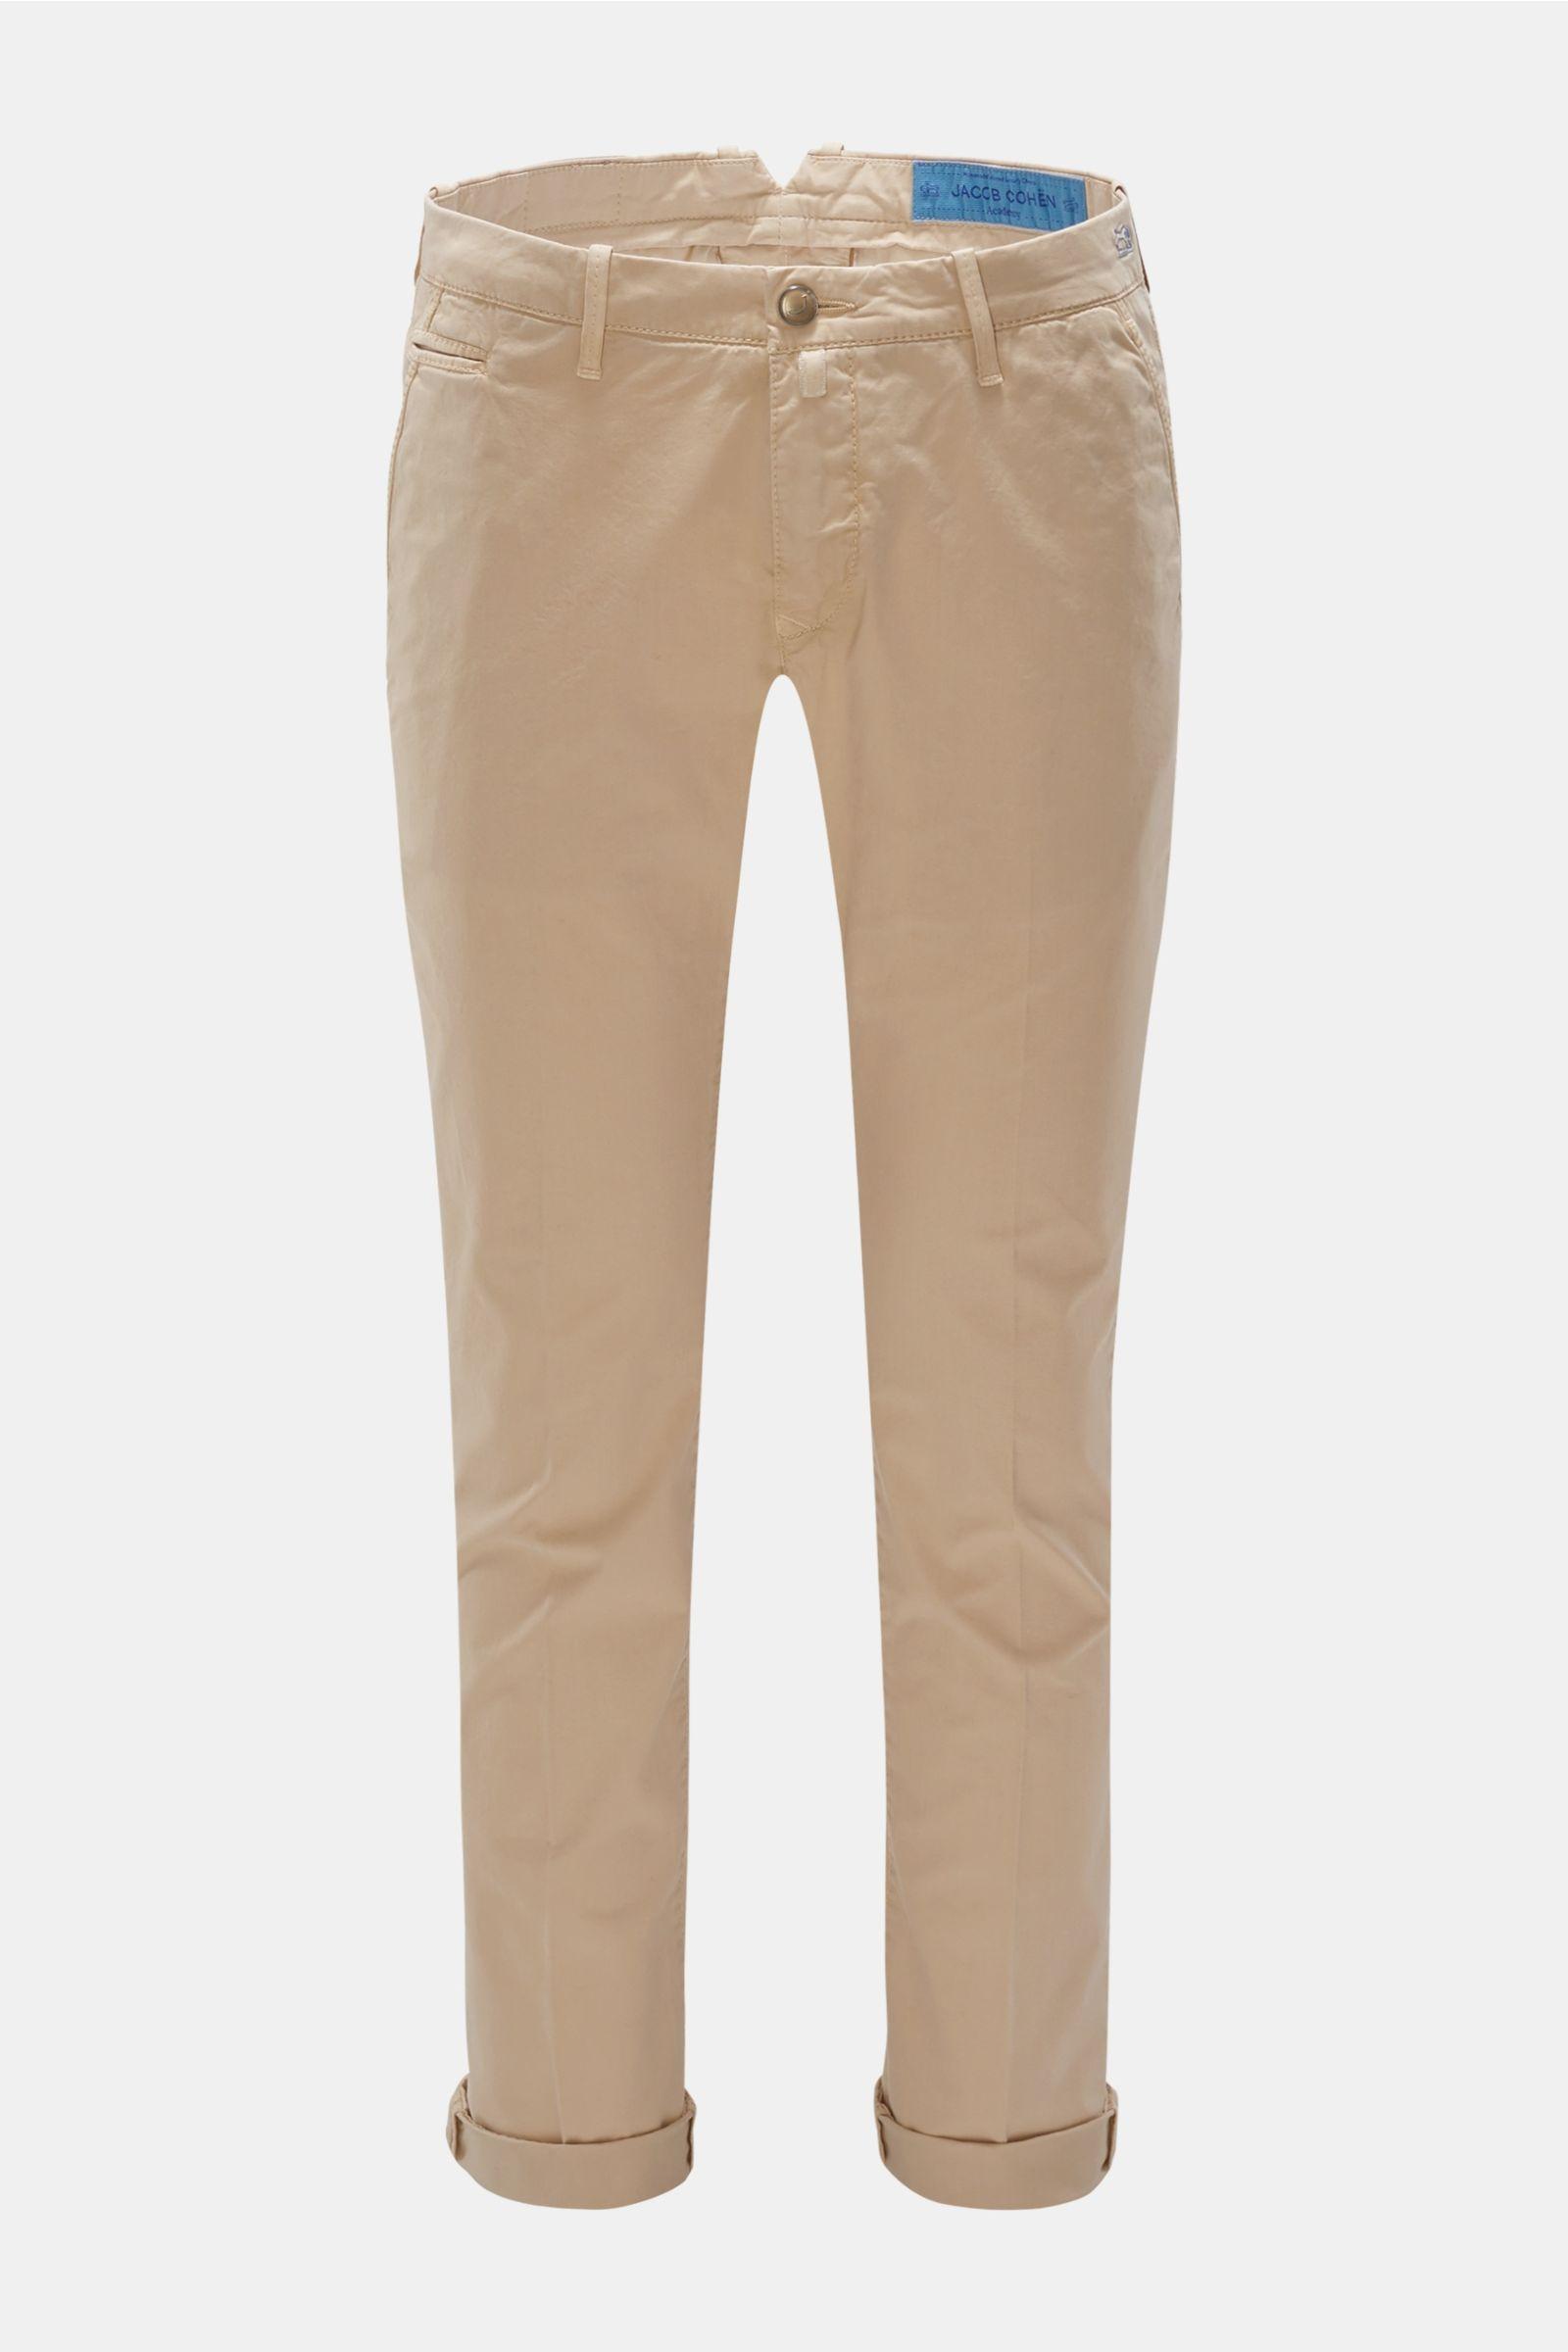 Chino 'B Comfort Slim Fit' beige